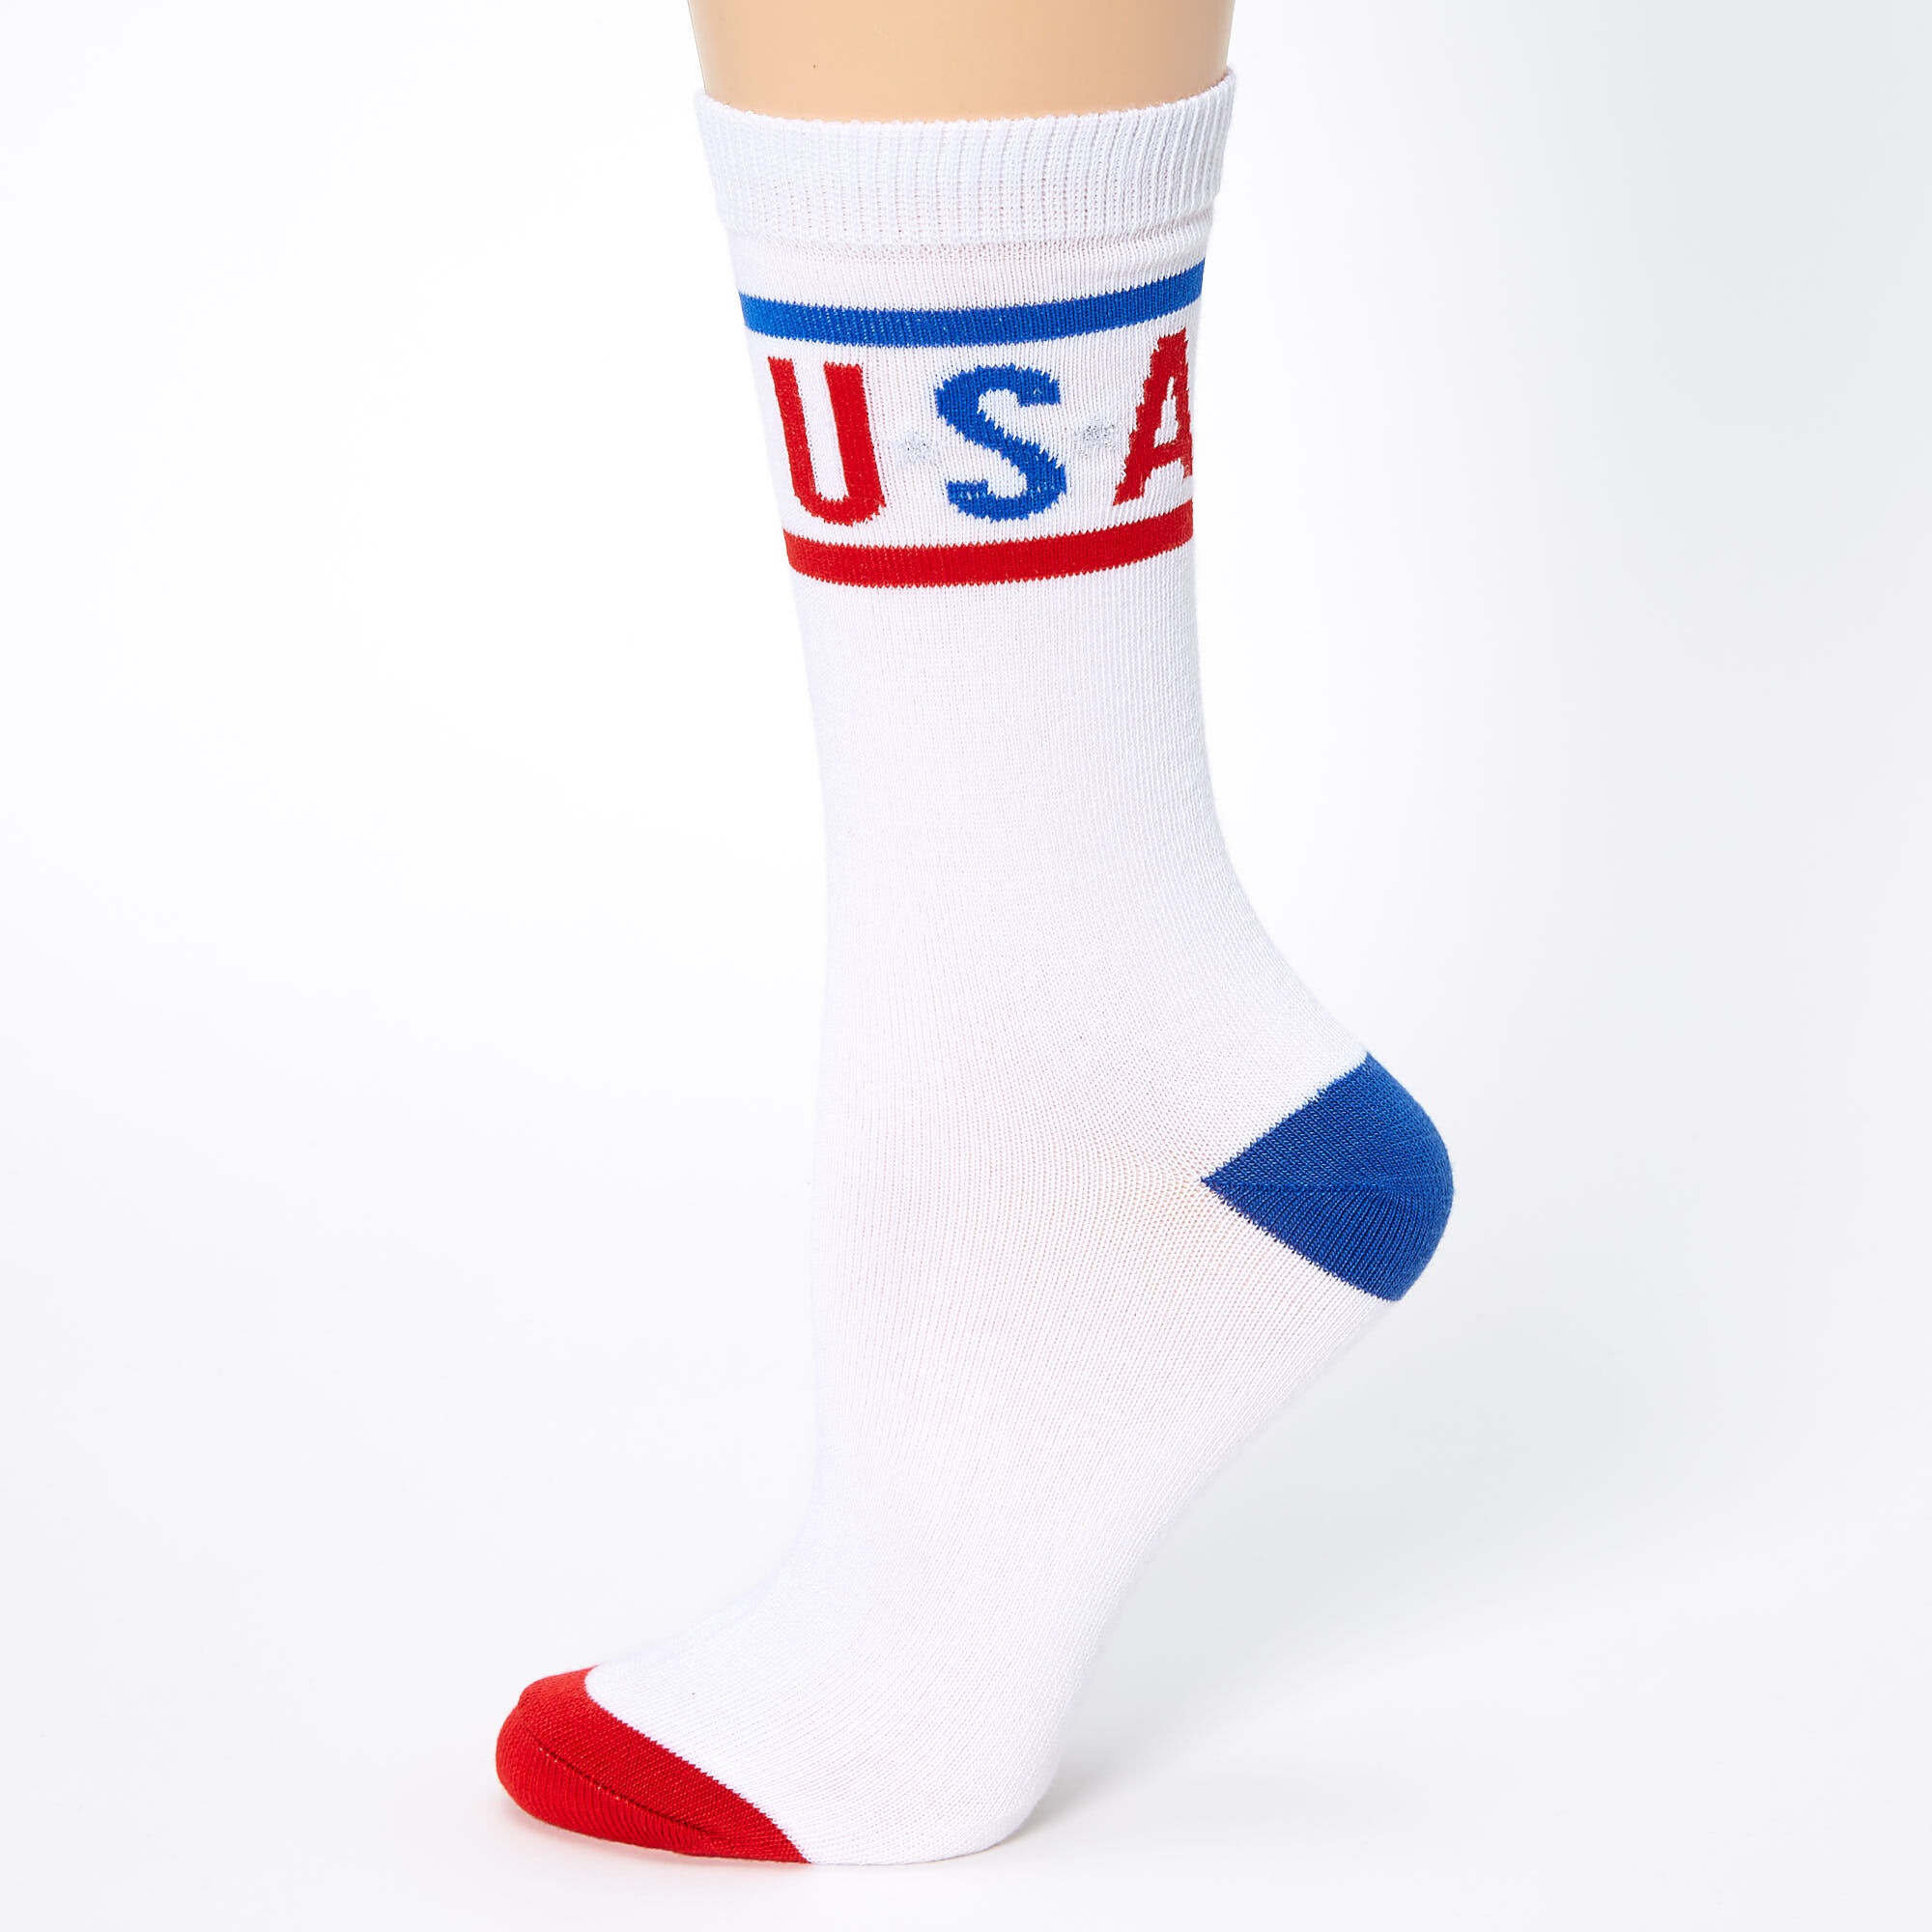 Flag Of France Printed Crew Socks Warm Over Boots Stocking Stylish Warm Sports Socks